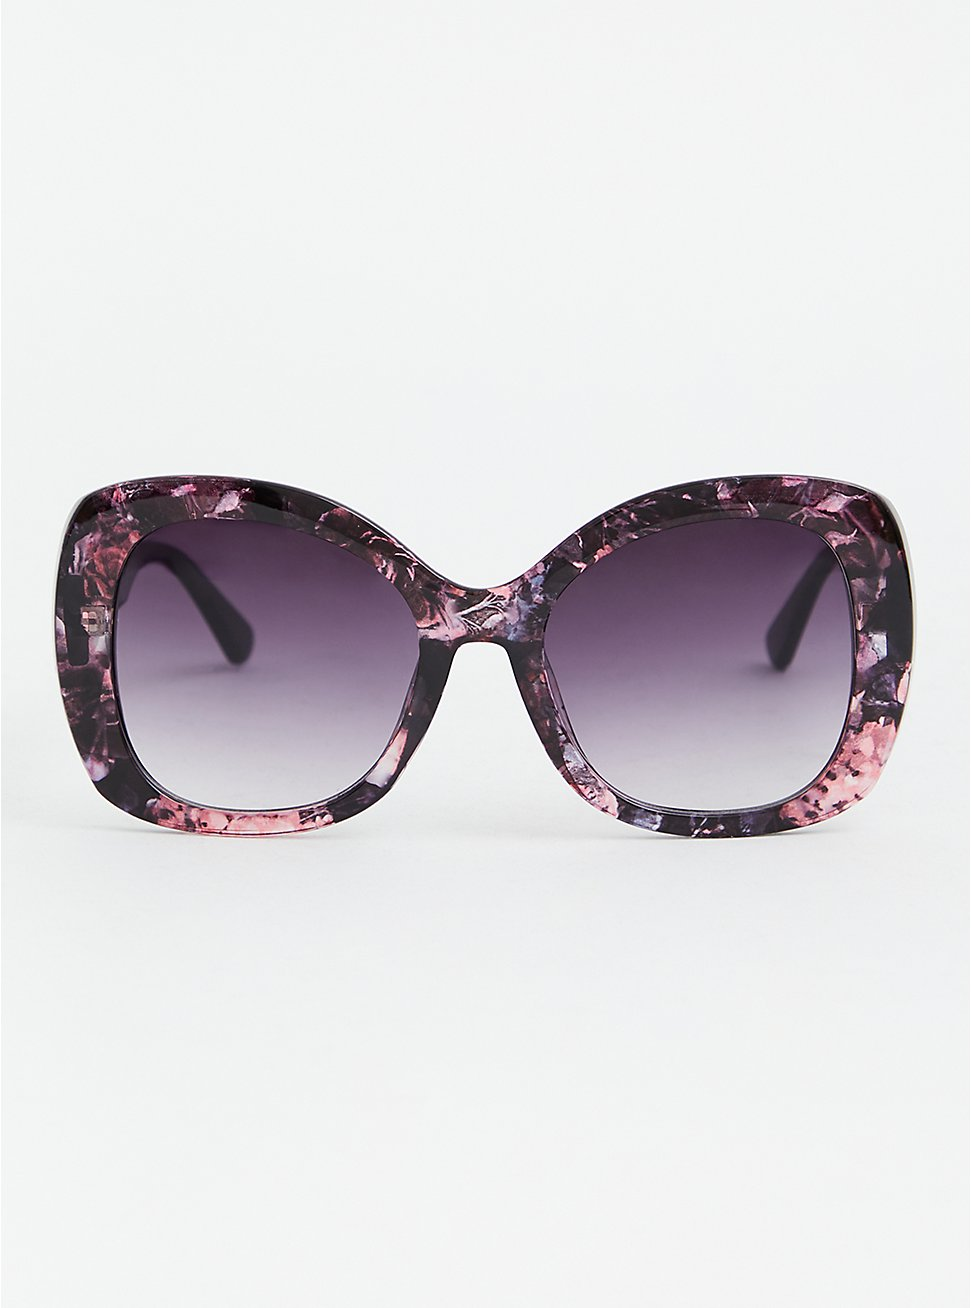 Floral Square Oversized Sunglasses, , hi-res